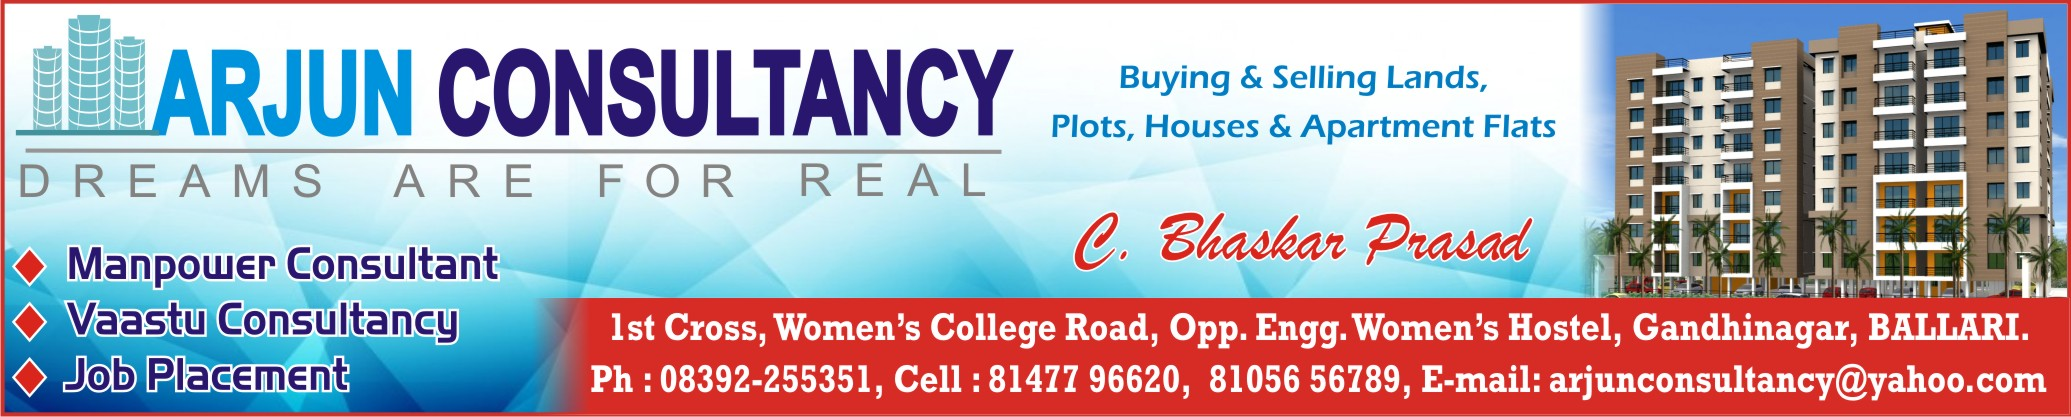 Arjun Consultancy